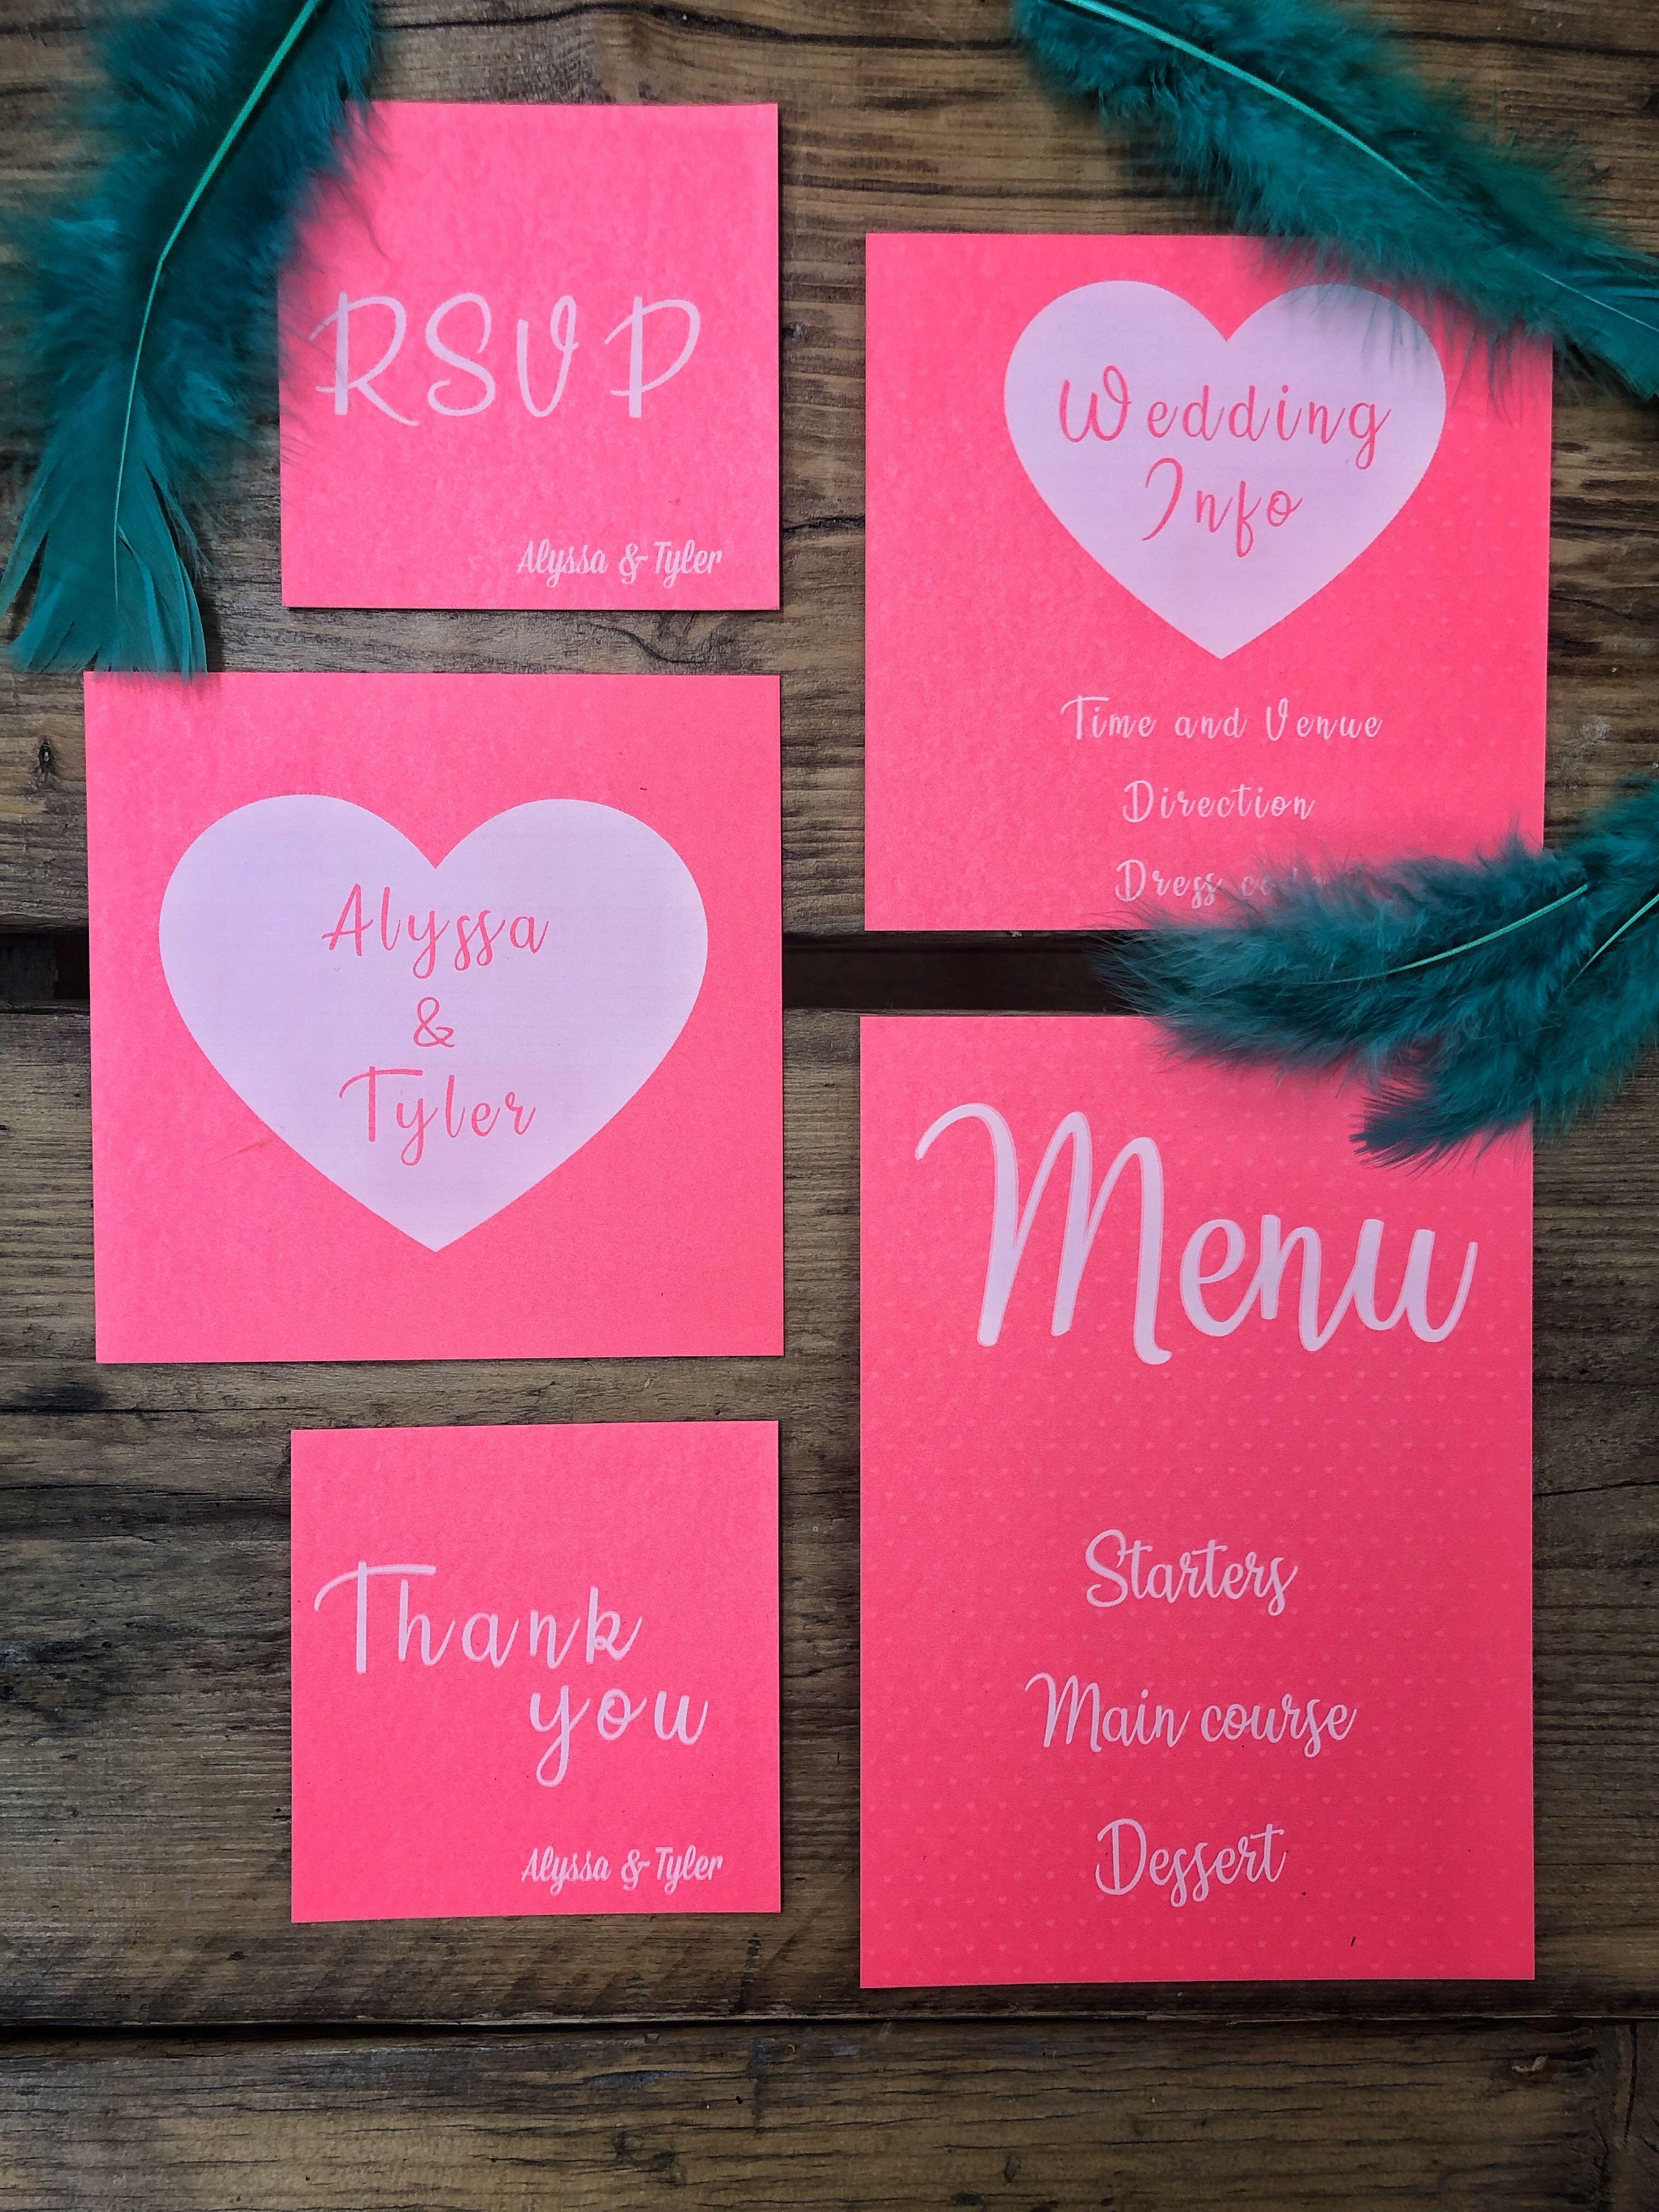 White ink on wedding stationery set